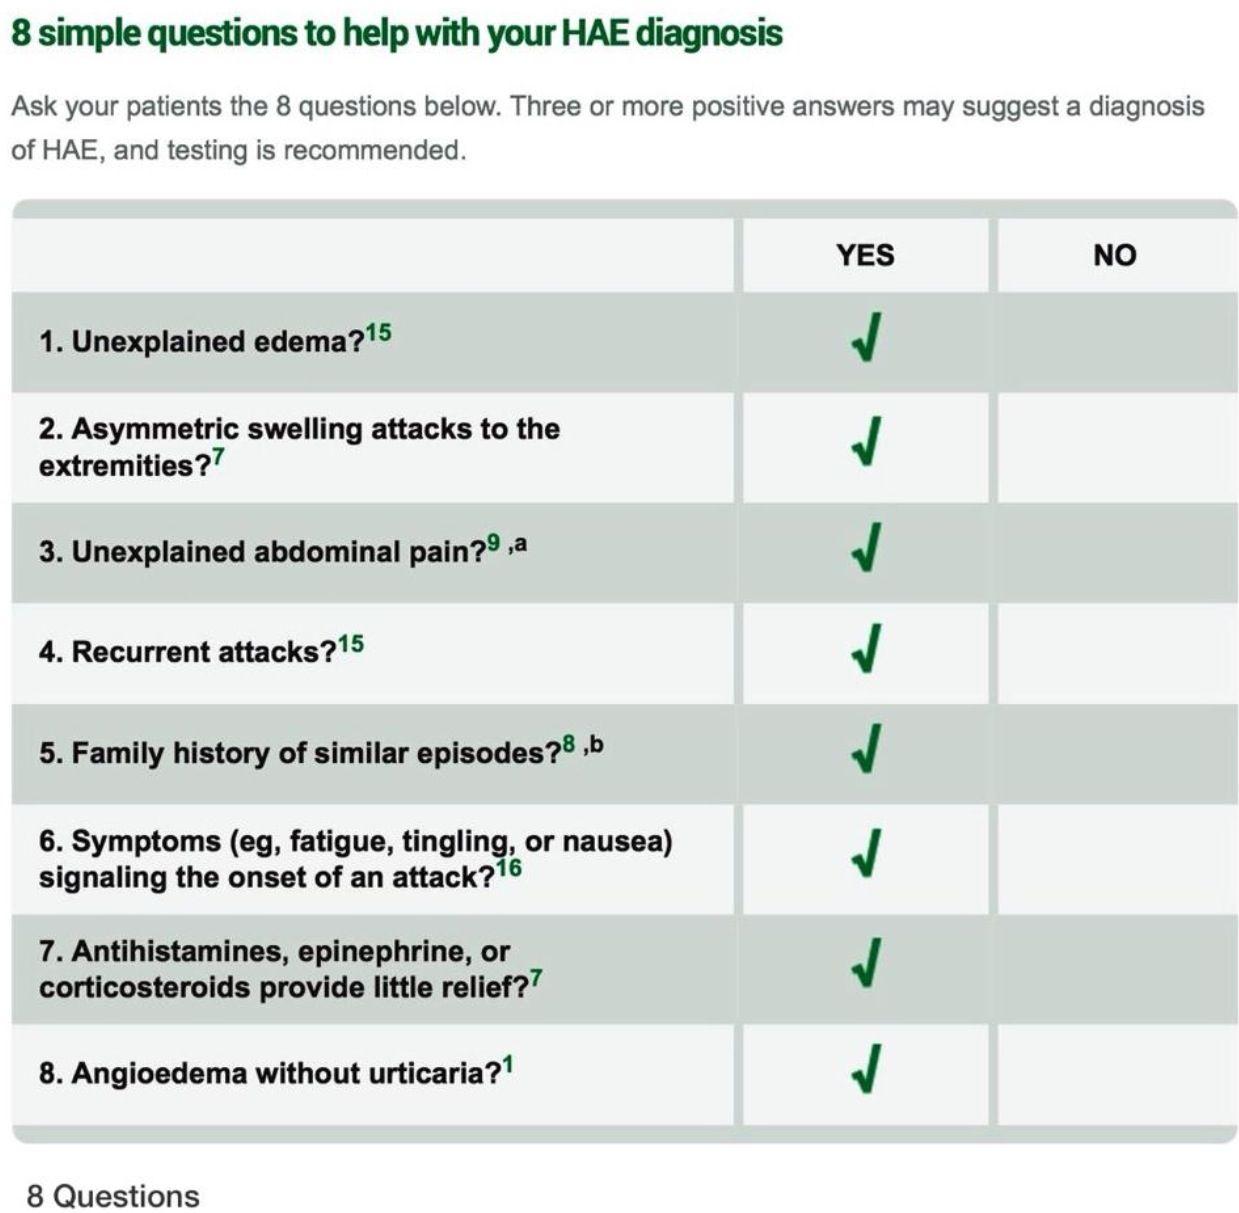 Diagnosing hereditary angioedema